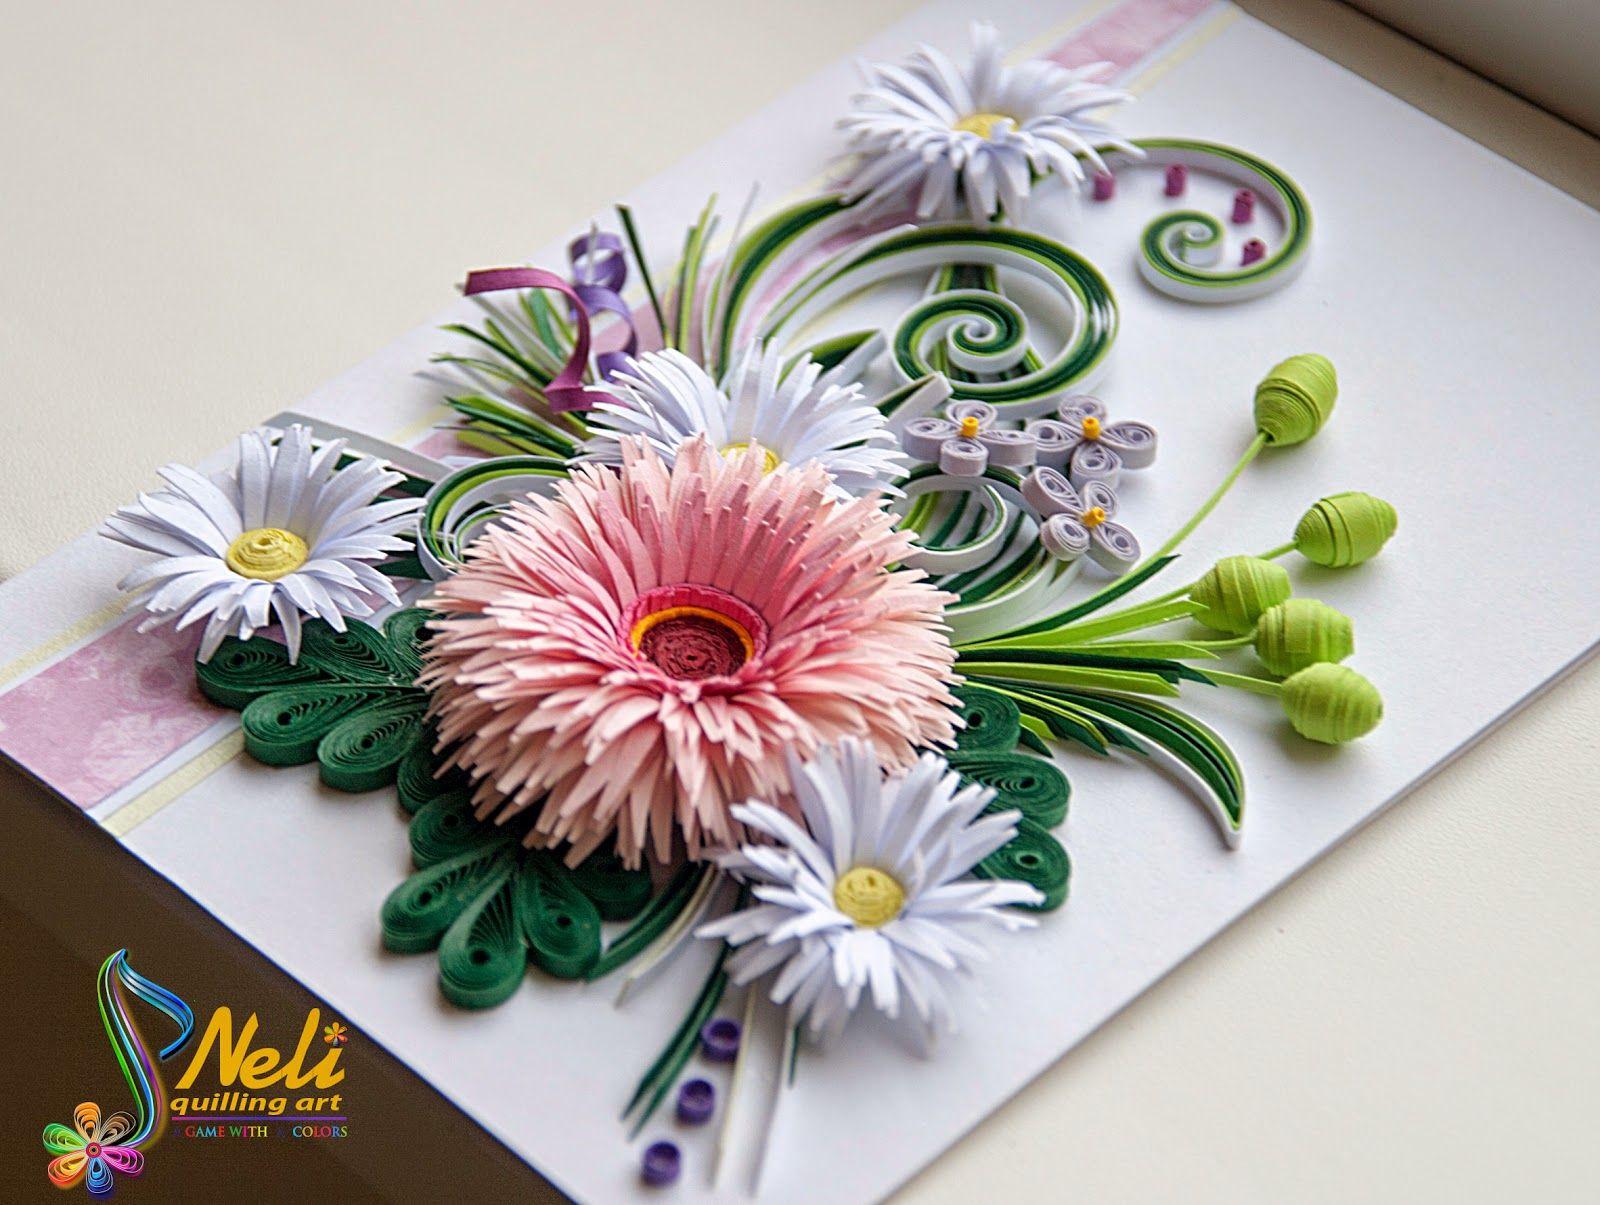 Мастер класс цветы для открытки, открыток